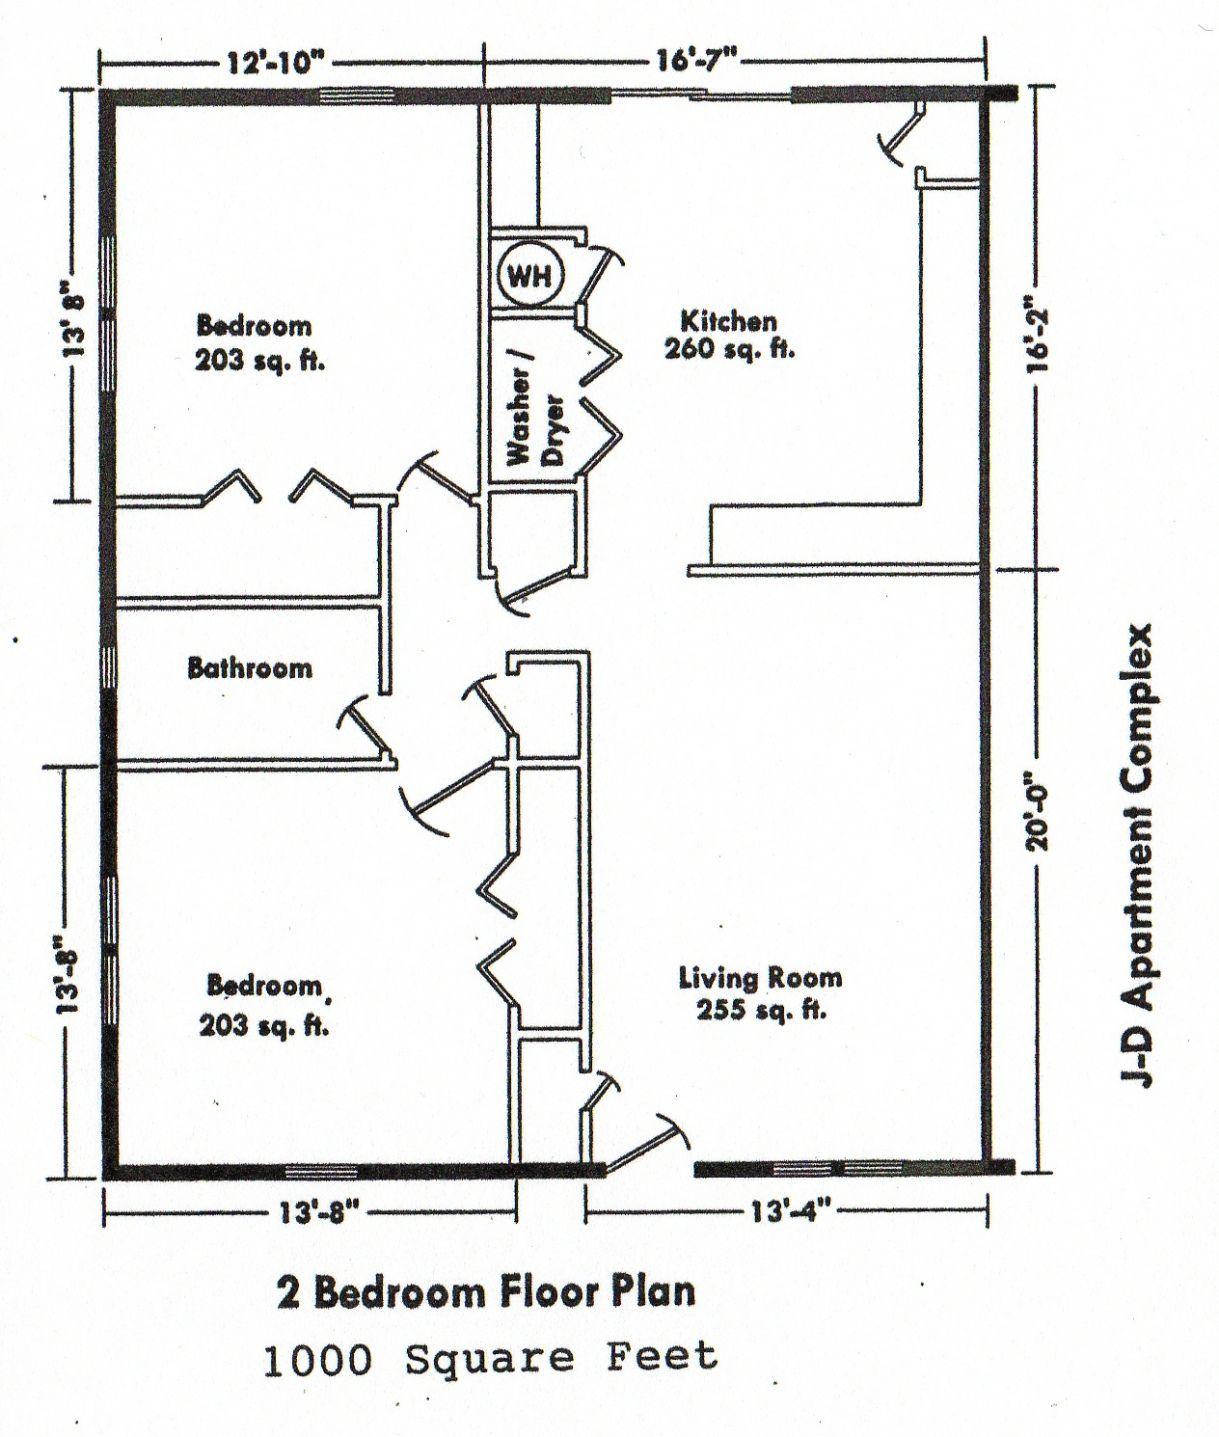 2 Bedroom Addition Floor Plans Space Saving Bedroom